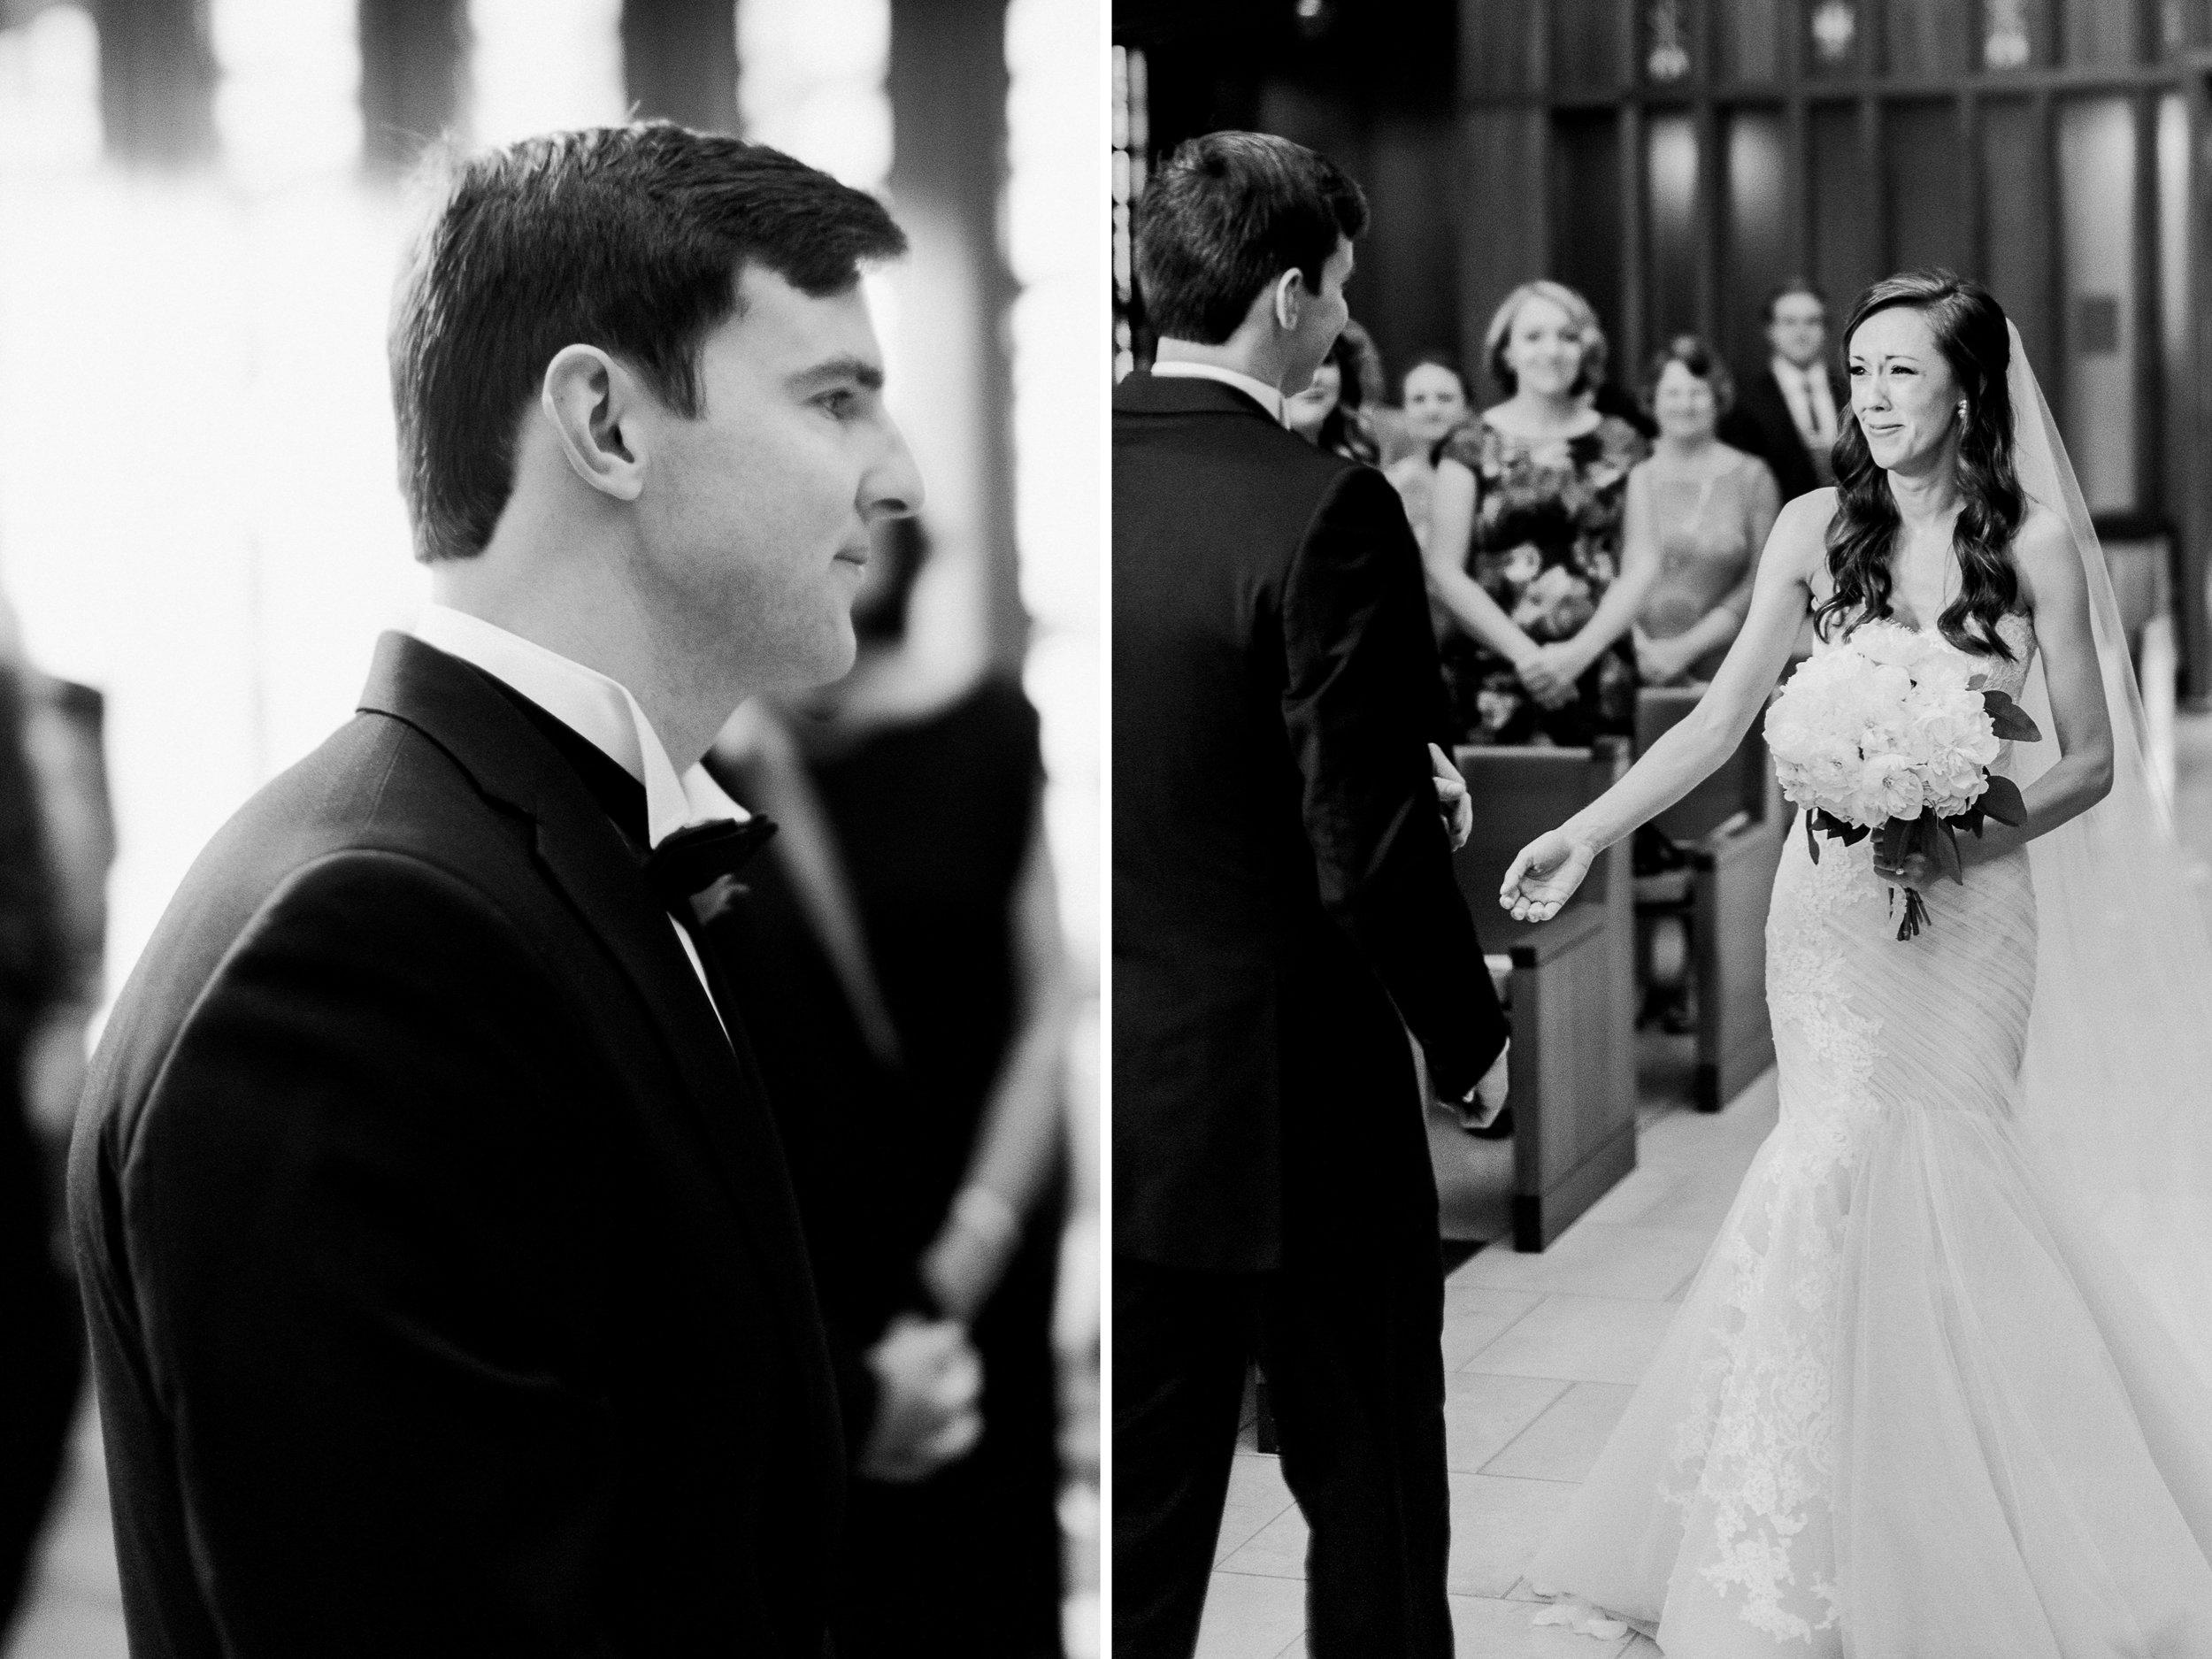 St.-Philip-Presbyterian-Church-Houston-Wedding-Ceremony-The-Junior-League-Of-Houston-Reception-Dana-Fernandez-Photography-Fine-Art-Film-120.jpg